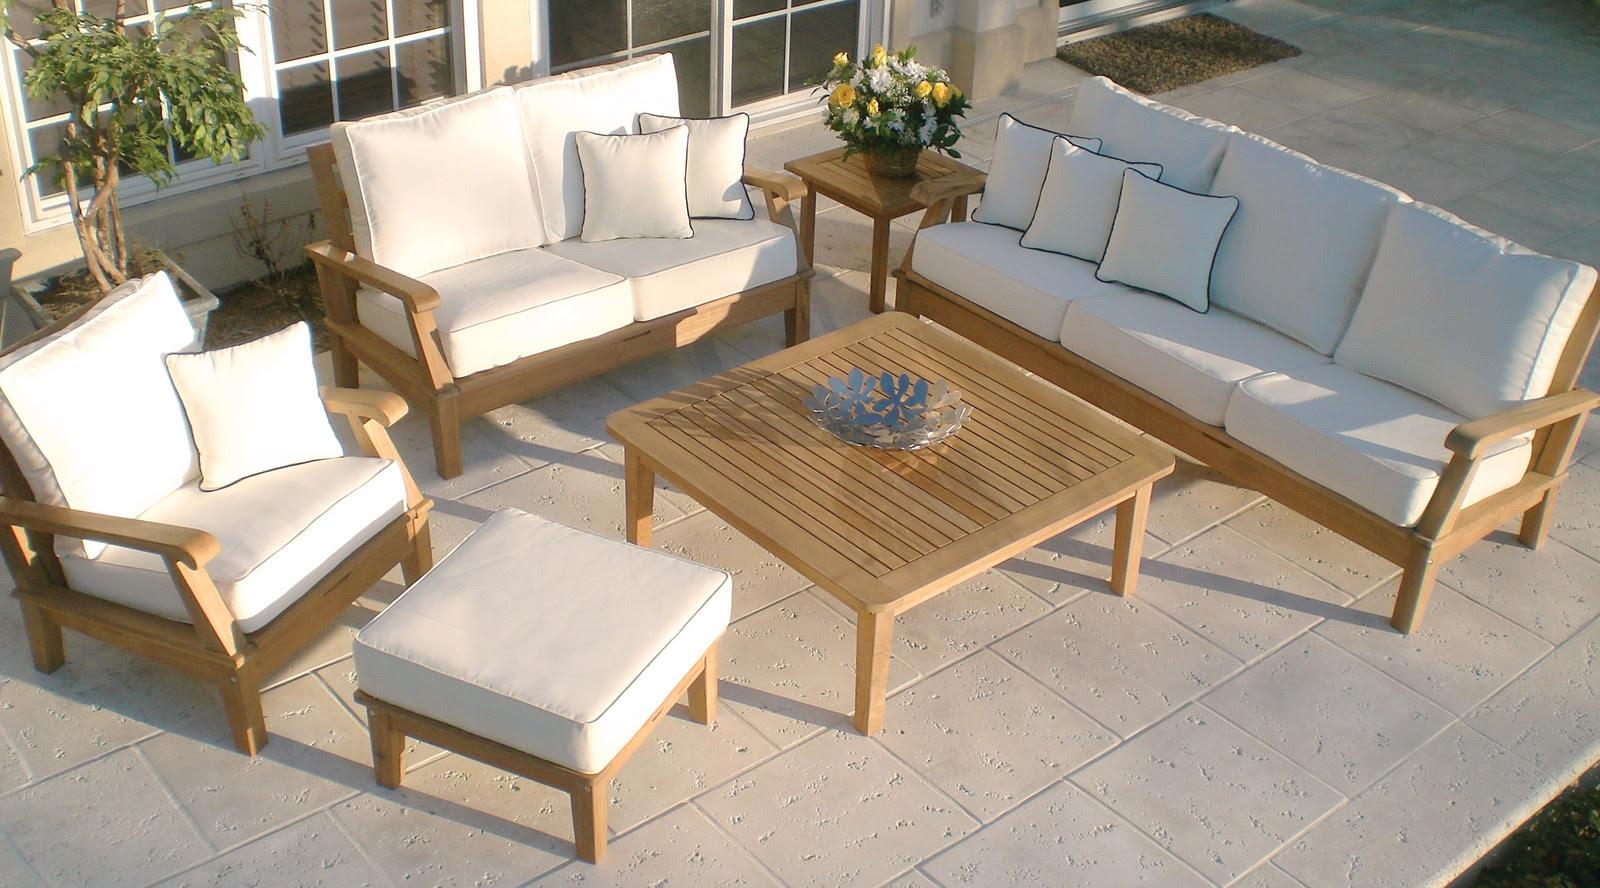 Outdoor Teak Furniture - When Beauty Meets Function   Leaf ...